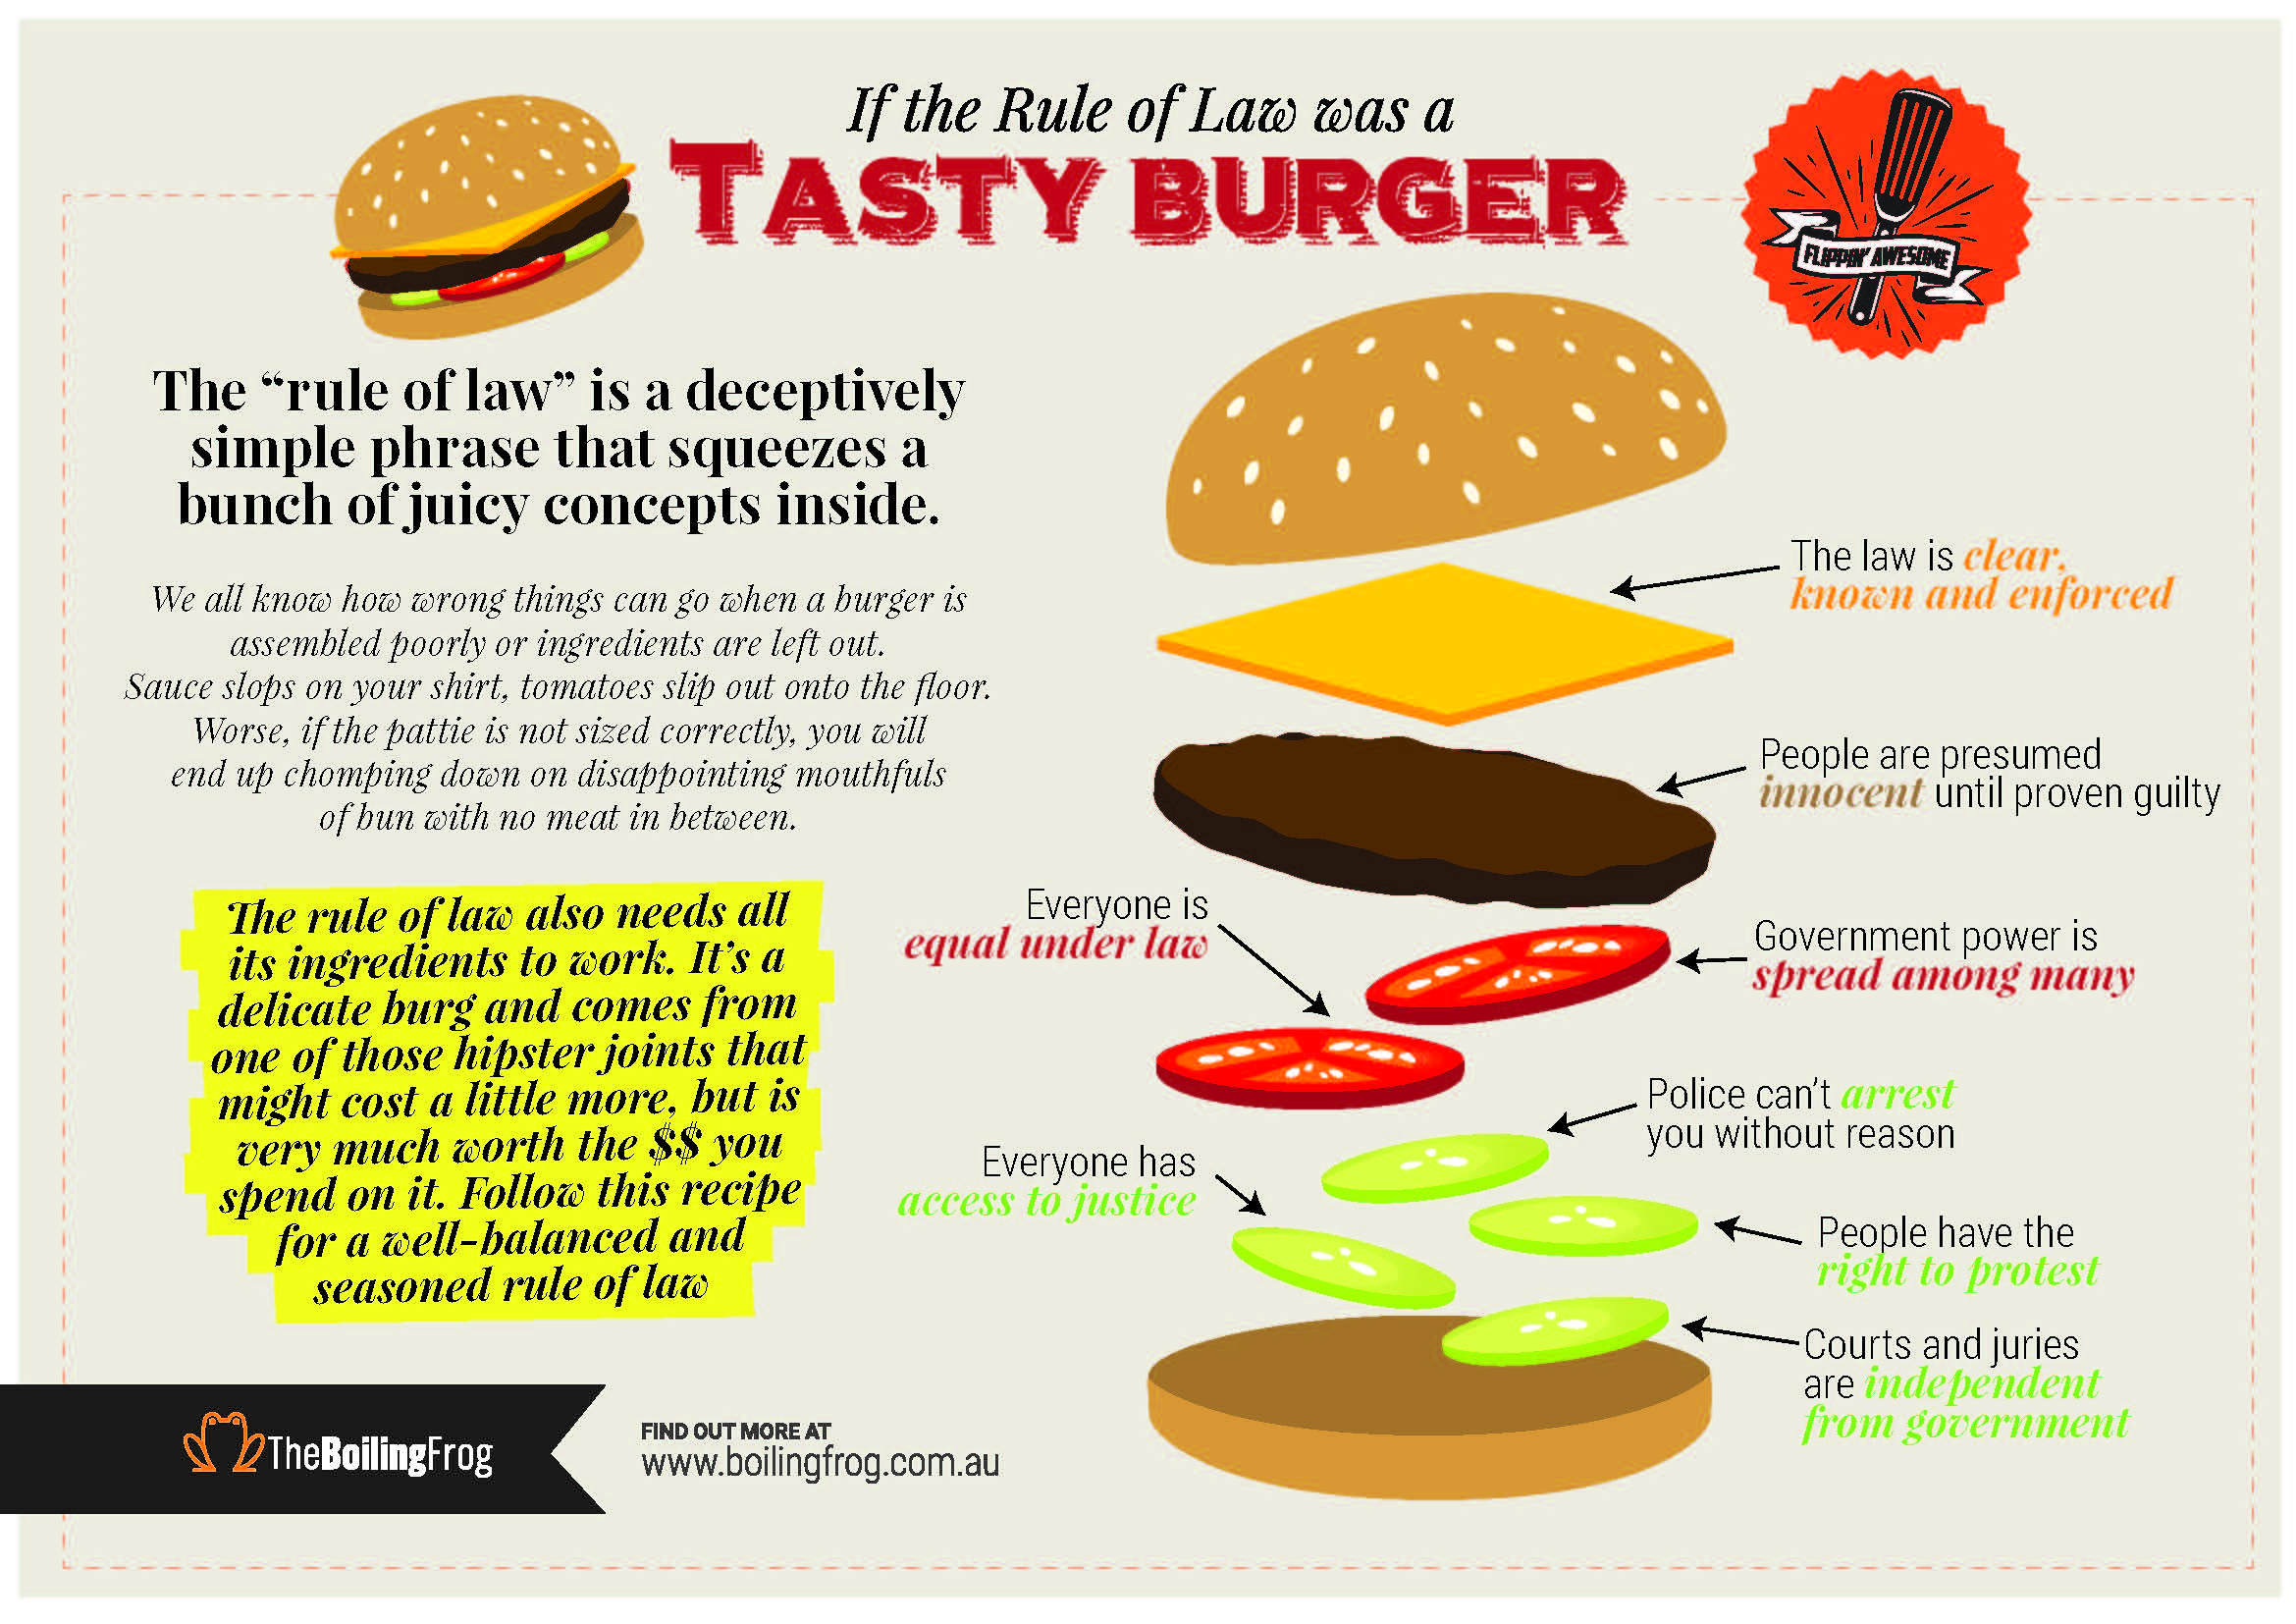 Tasty-RuleOfLaw-burger-002.jpg